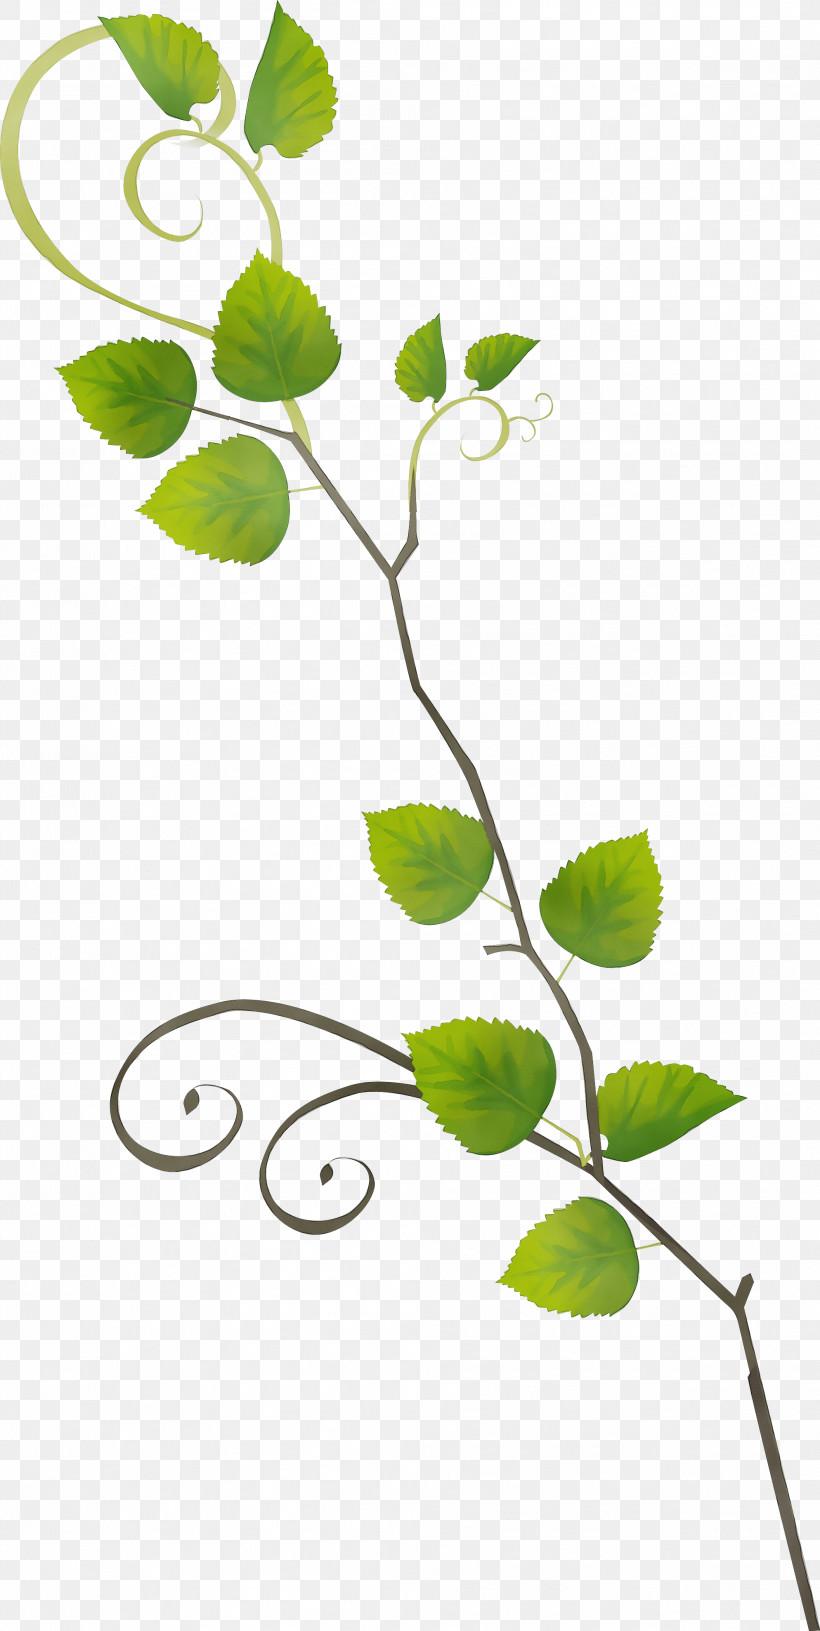 Flower Leaf Plant Branch Plant Stem, PNG, 1987x3954px, Watercolor, Branch, Flower, Leaf, Paint Download Free